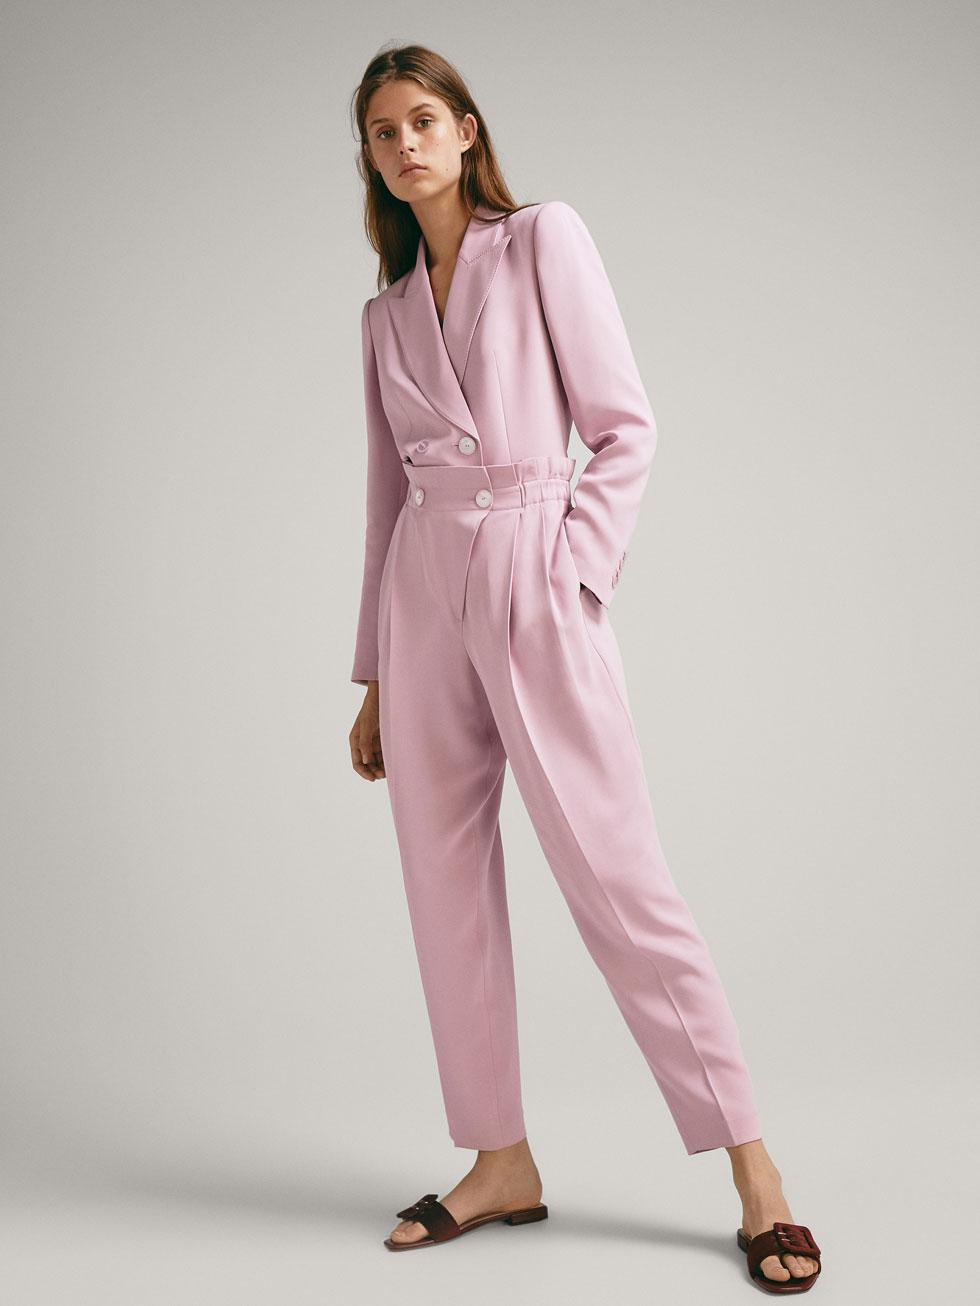 En clave pink: blazer (129 €) y pantalón (69,95 €), de Massimo Dutti.